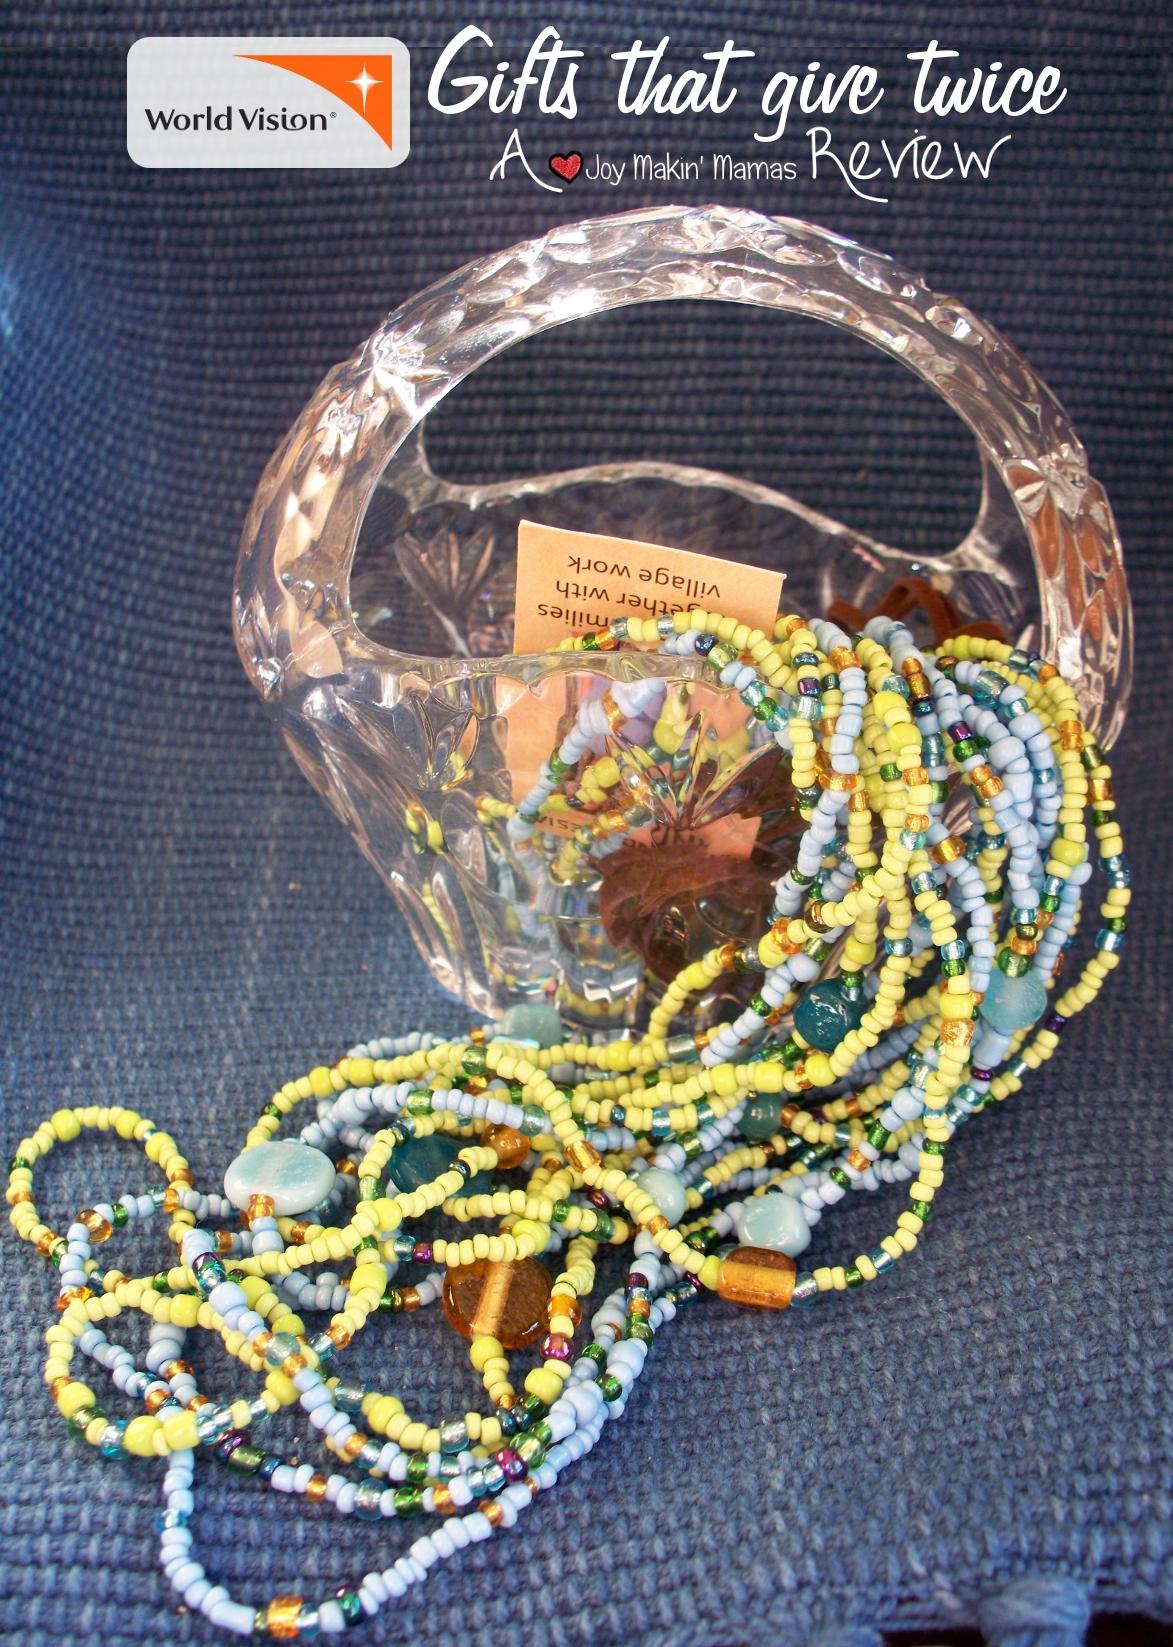 balinese necklace joy makin mamas review WorldVision Gifts